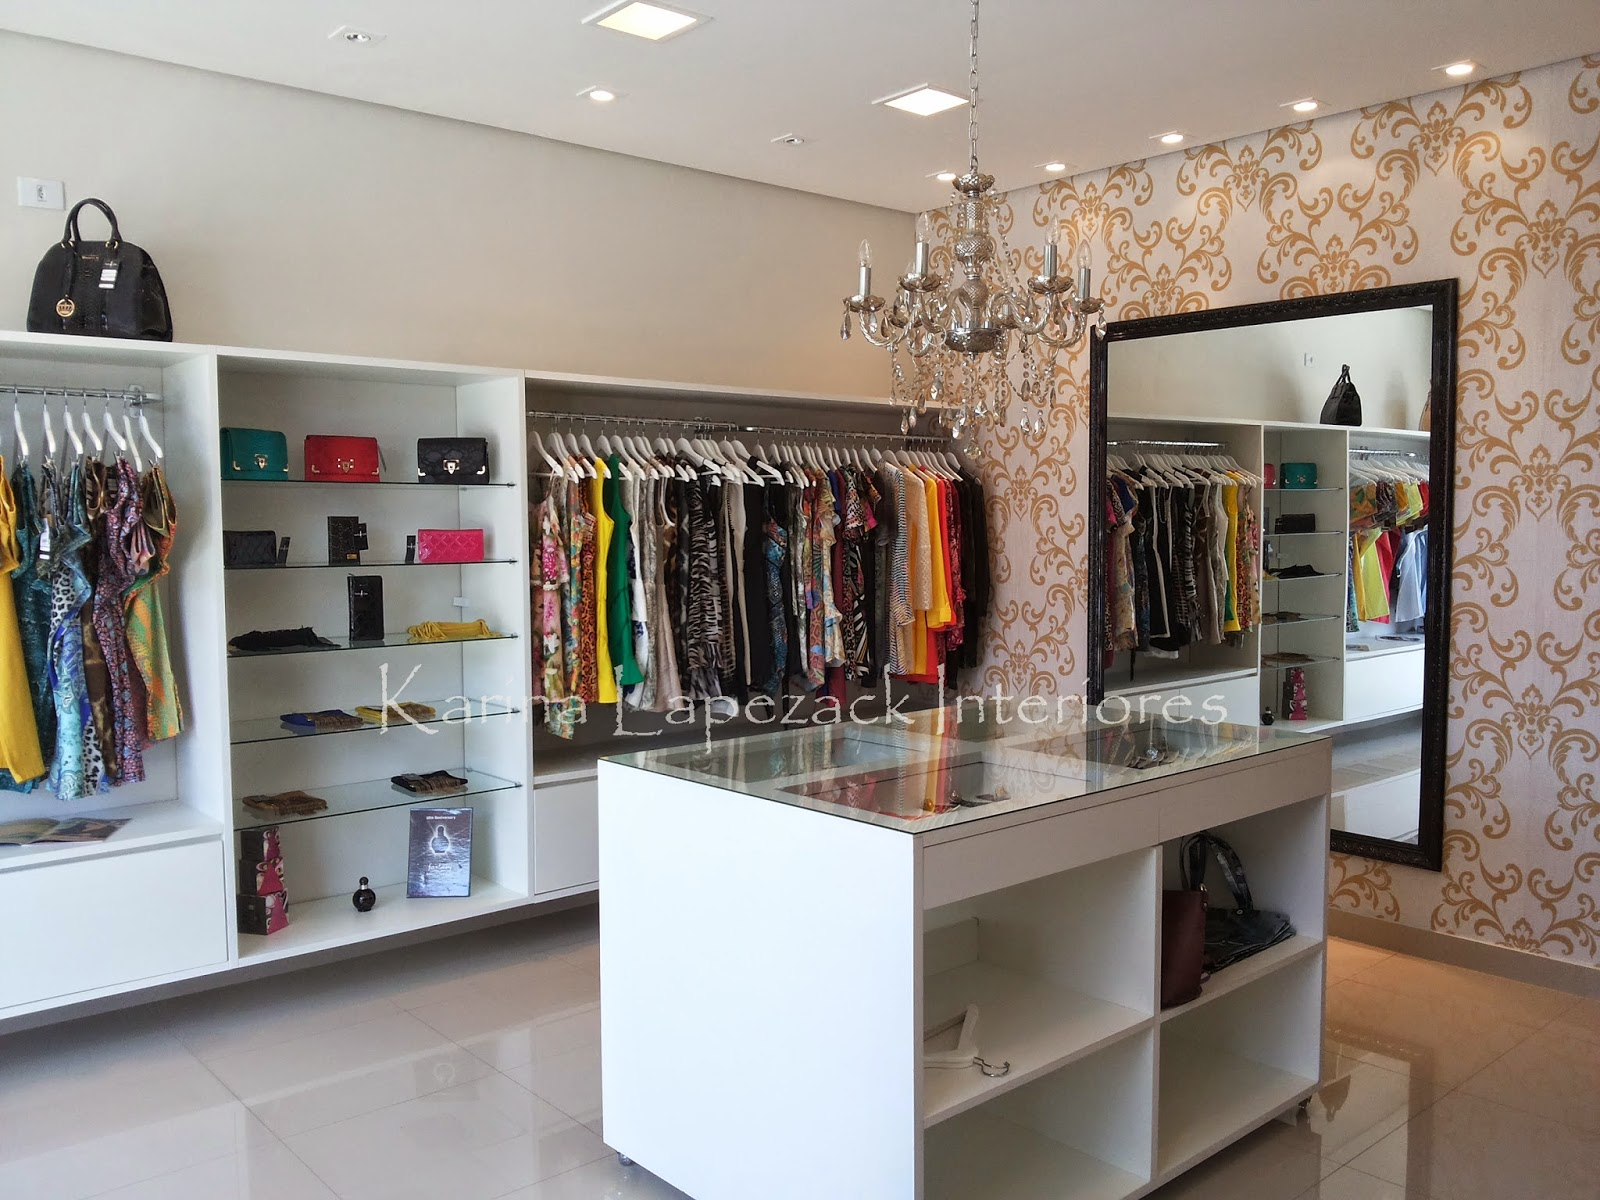 Excepcional Projeto Boutique de Roupas Femininas OE97